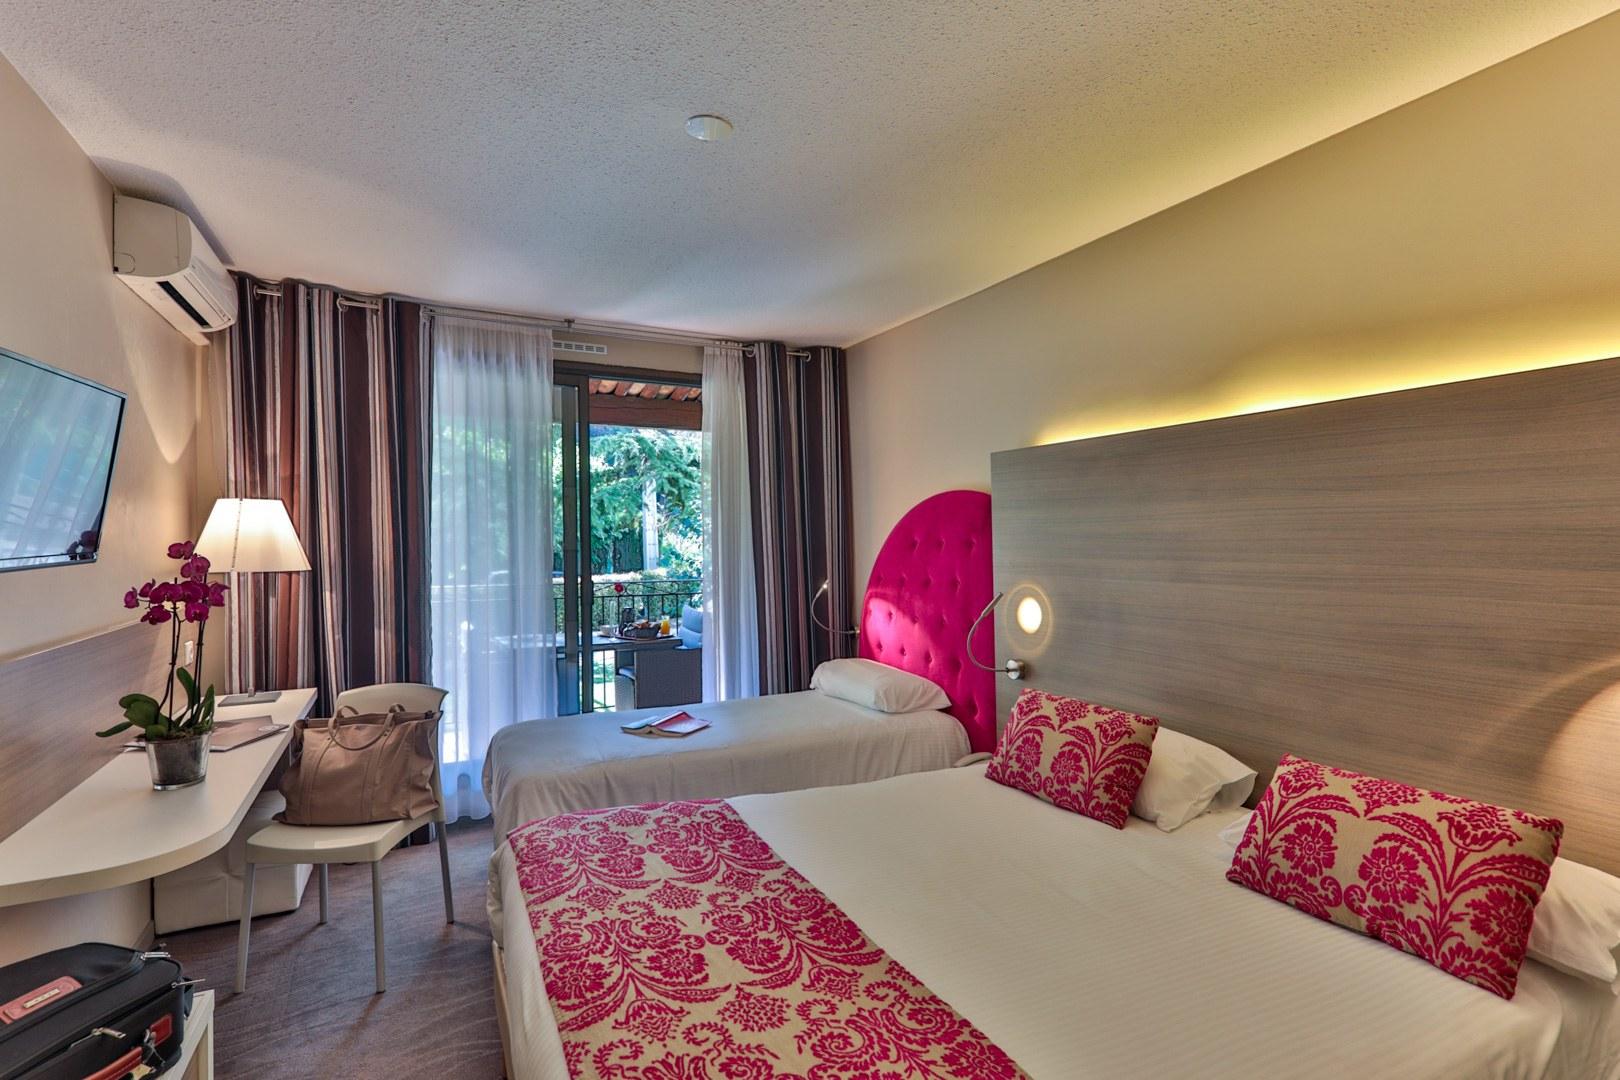 Restaurant-hotel-en-provence-chambre-double